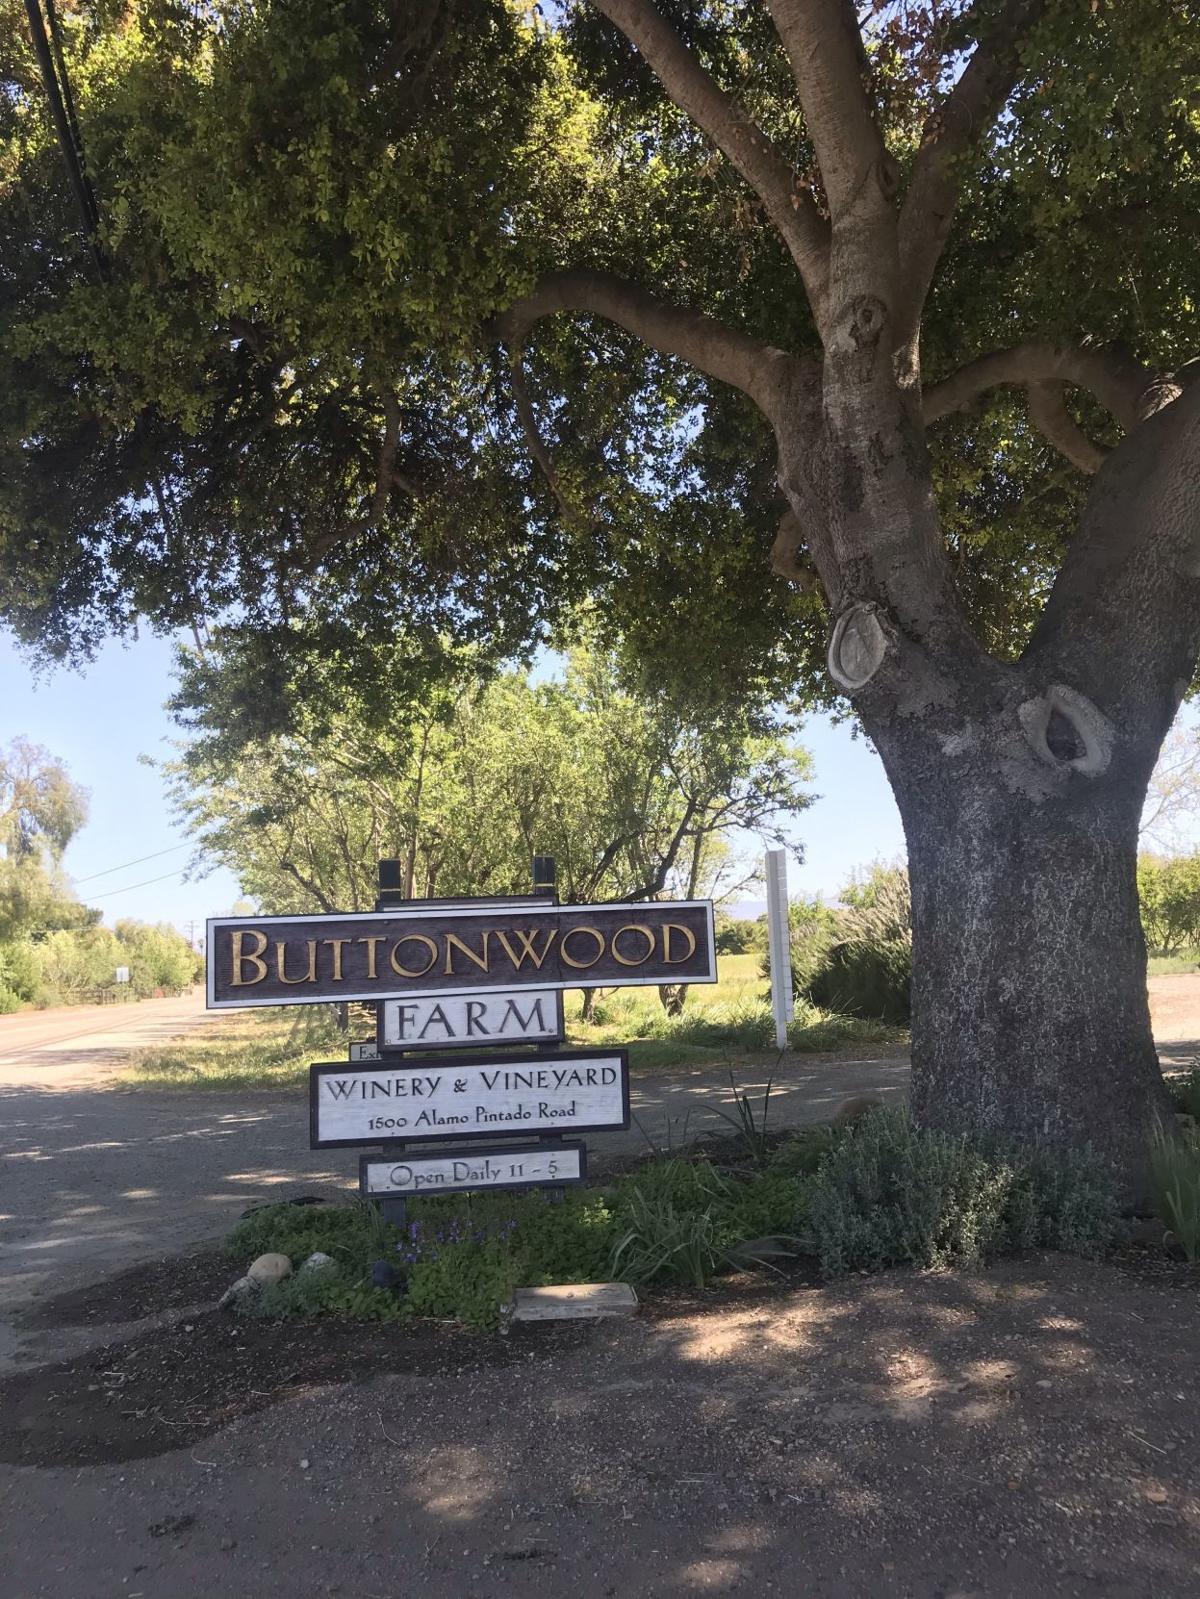 Buttonwood Winery & Vineyard Solvang